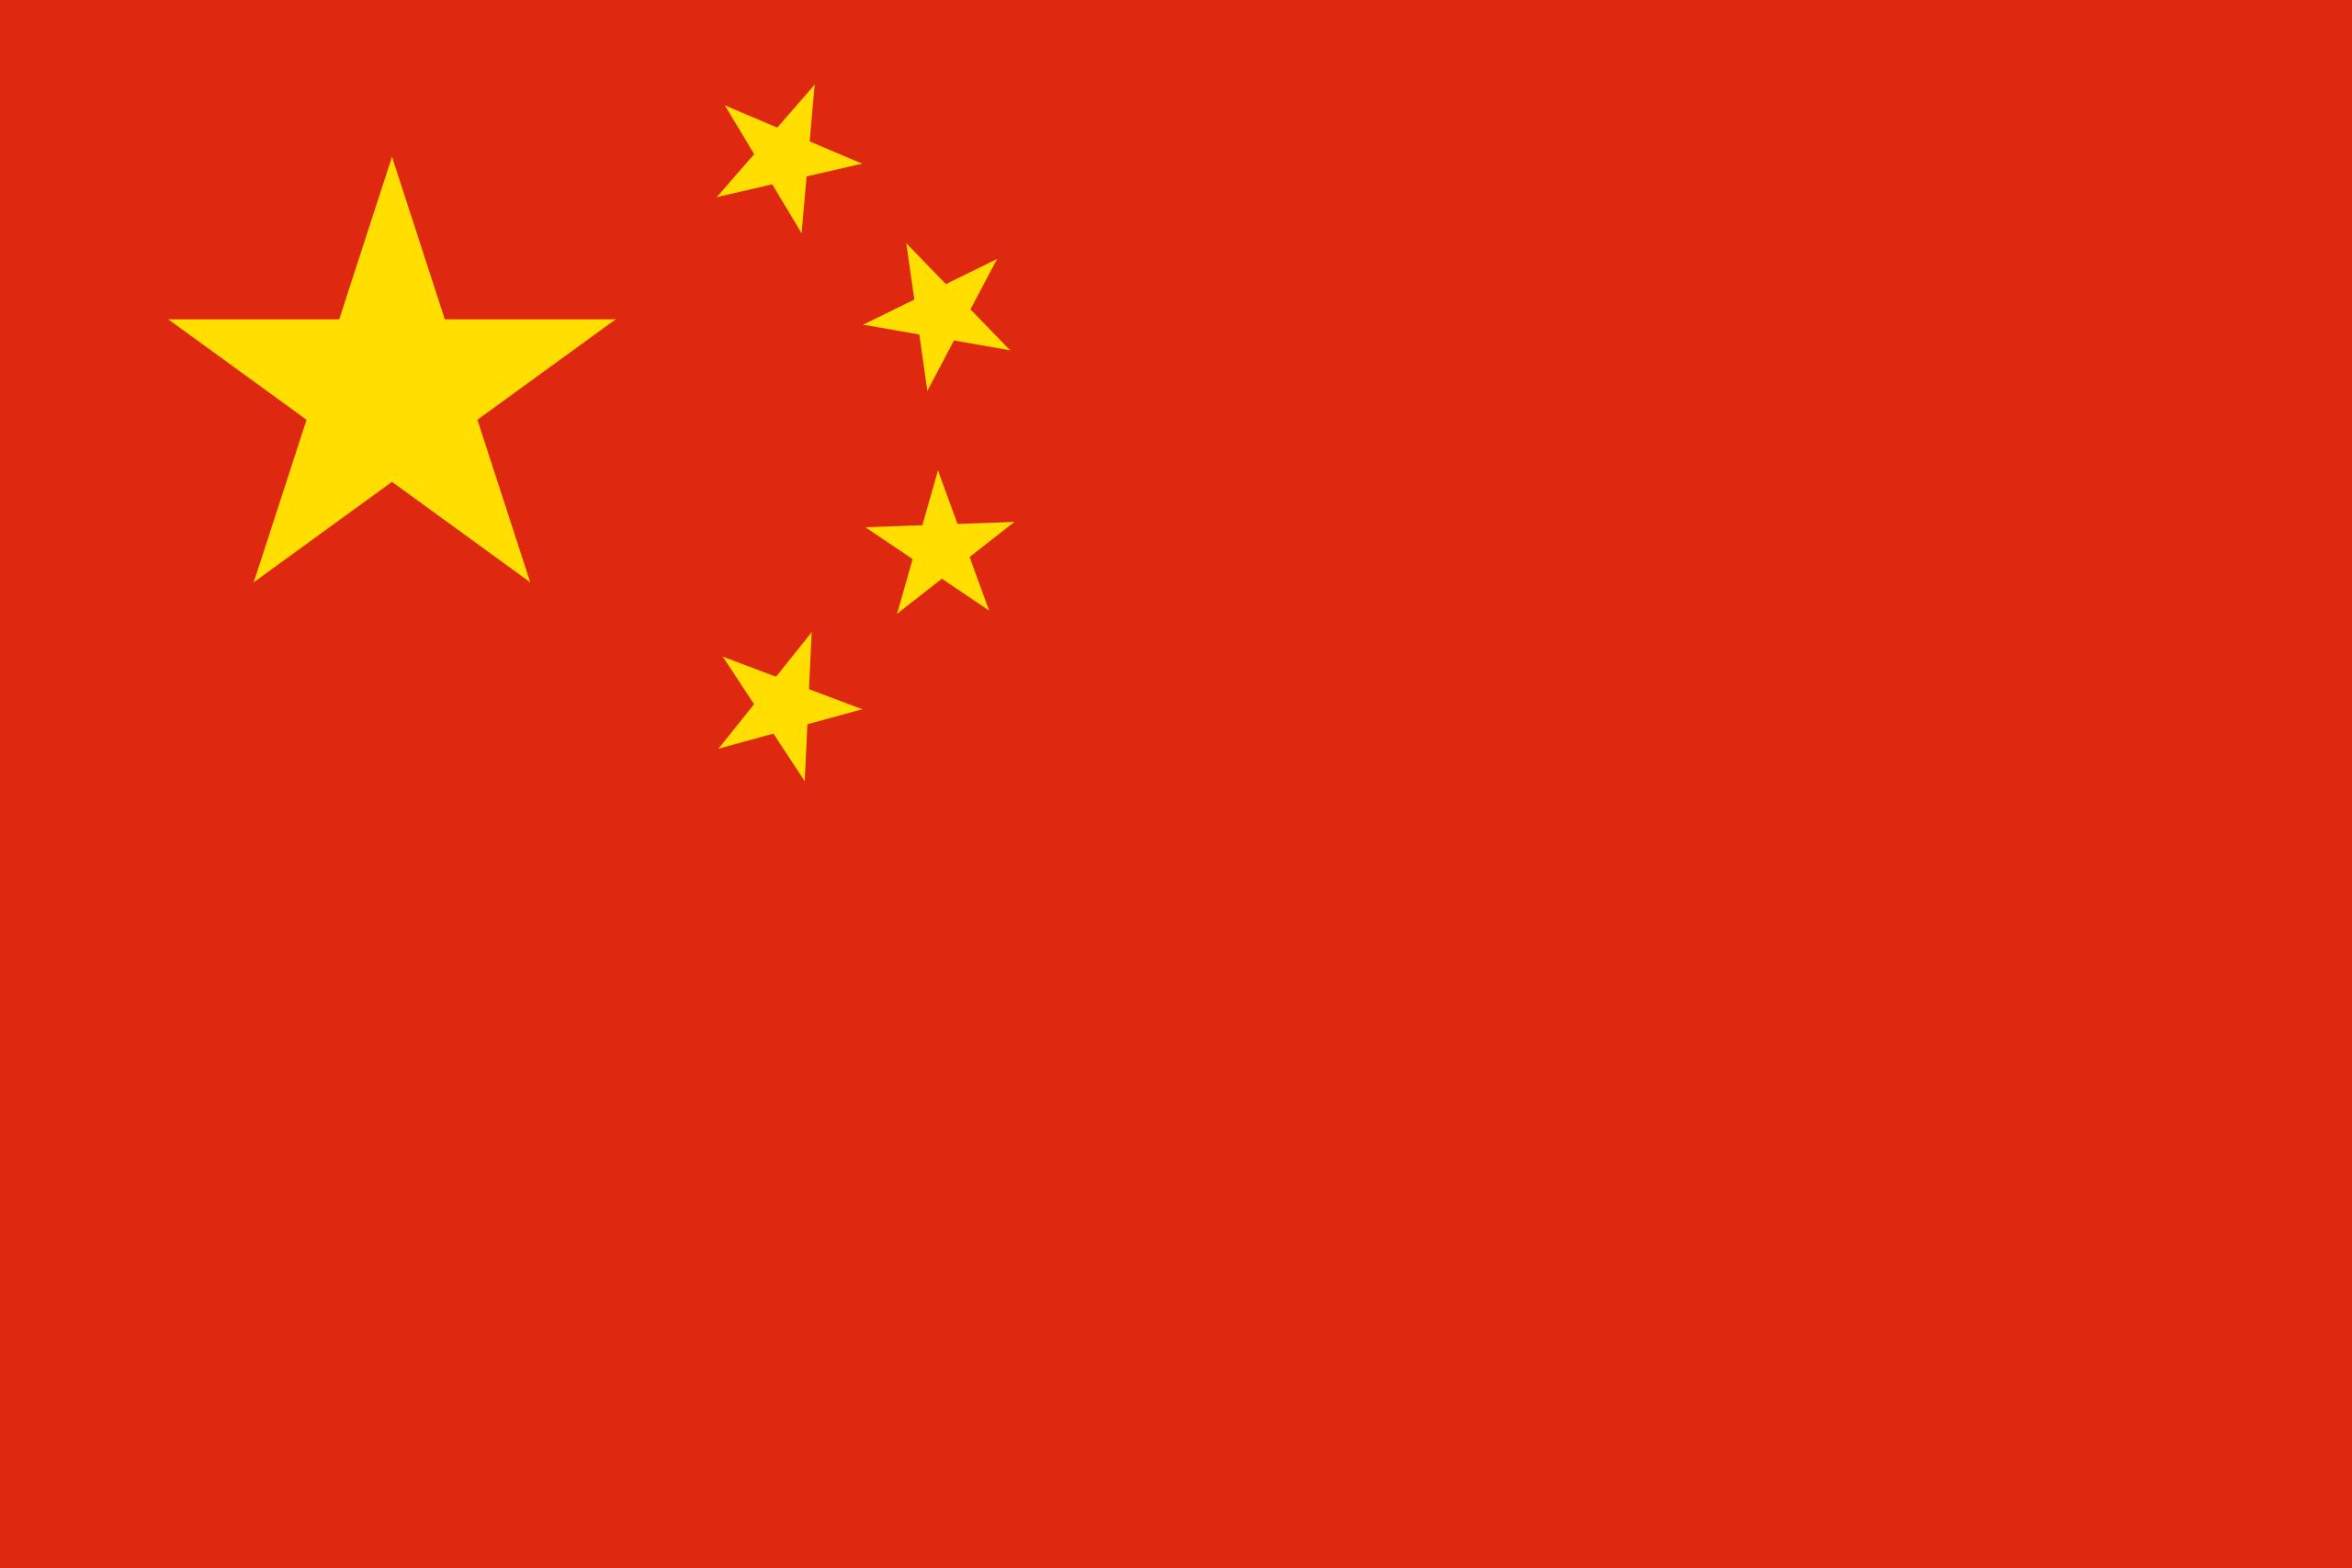 Cina, paese, emblema, logo, simbolo - Sfondi HD - Professor-falken.com